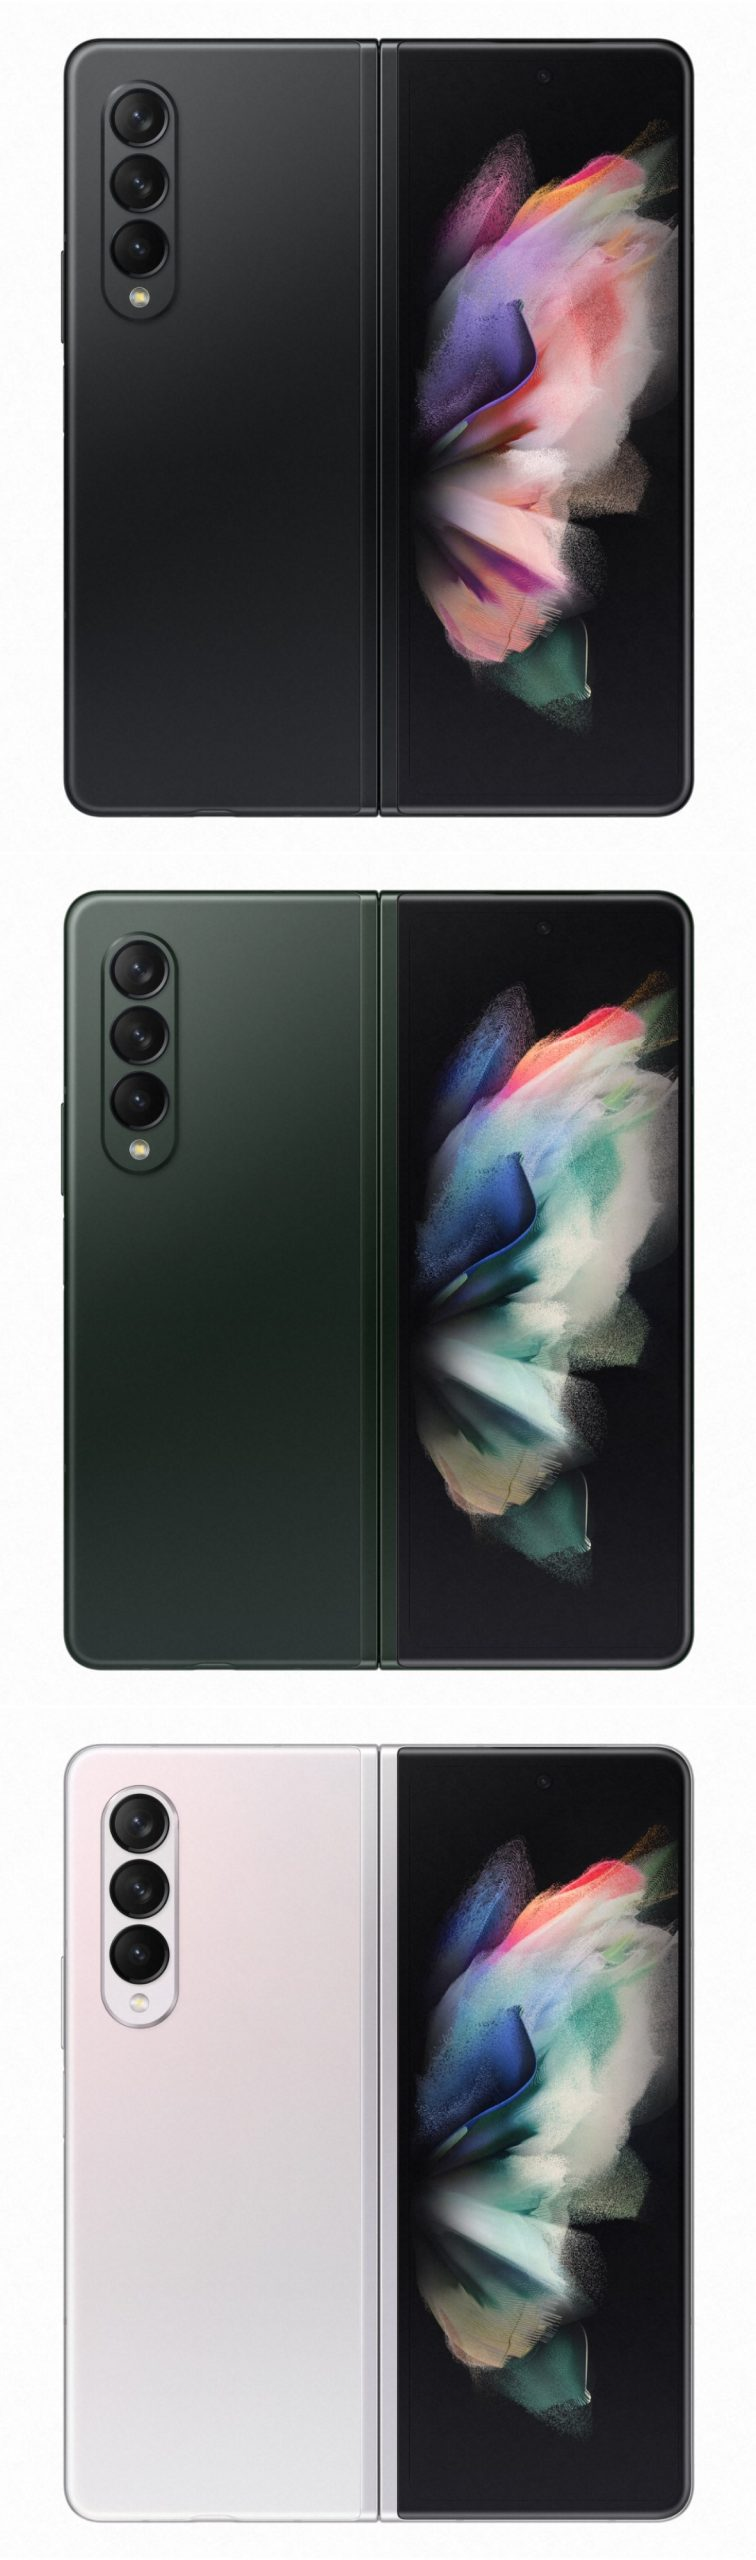 Galaxy Z Fold3 5G avattuna eri väreissä.